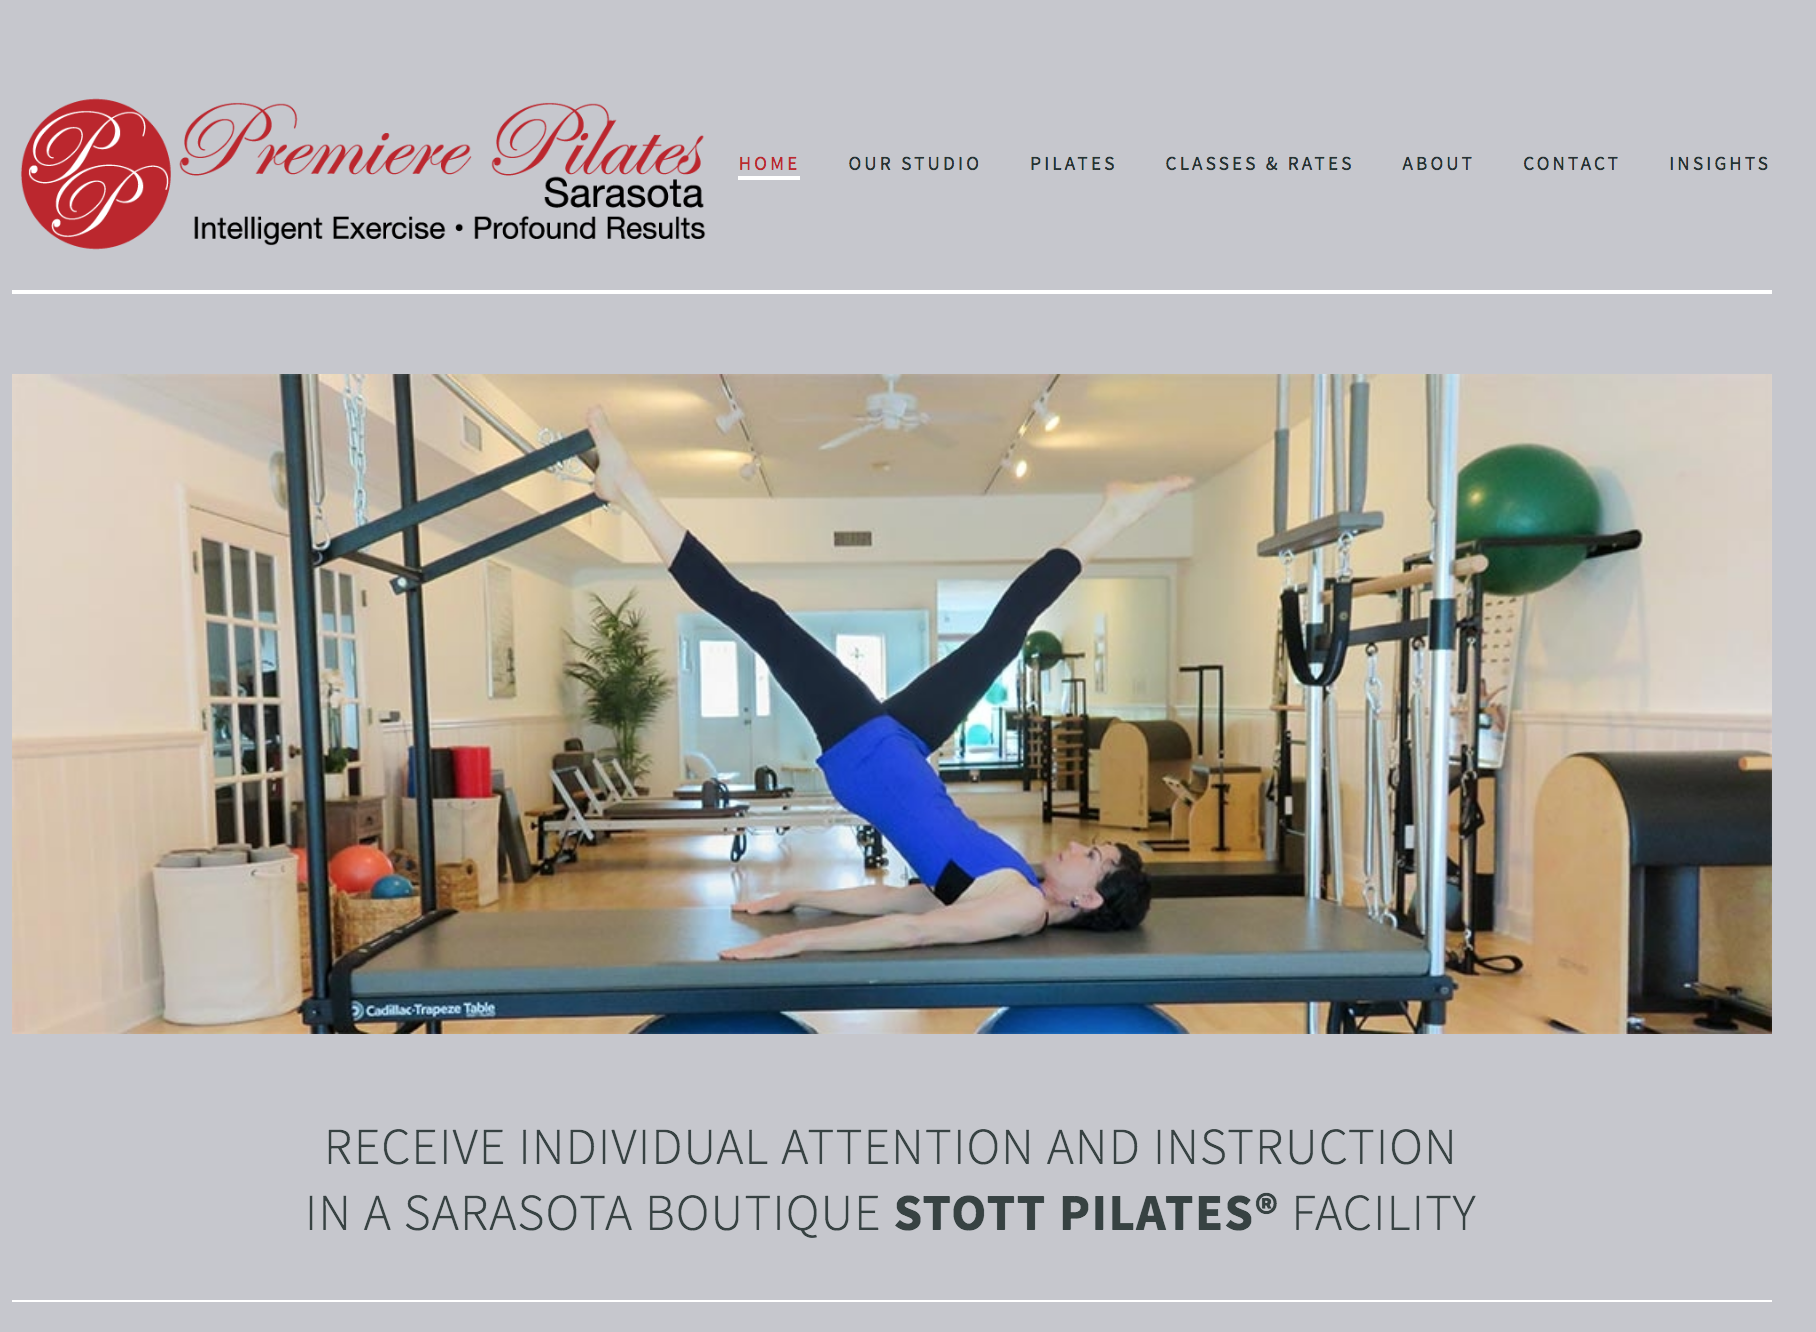 Premiere Pilates Sarasota Website Project